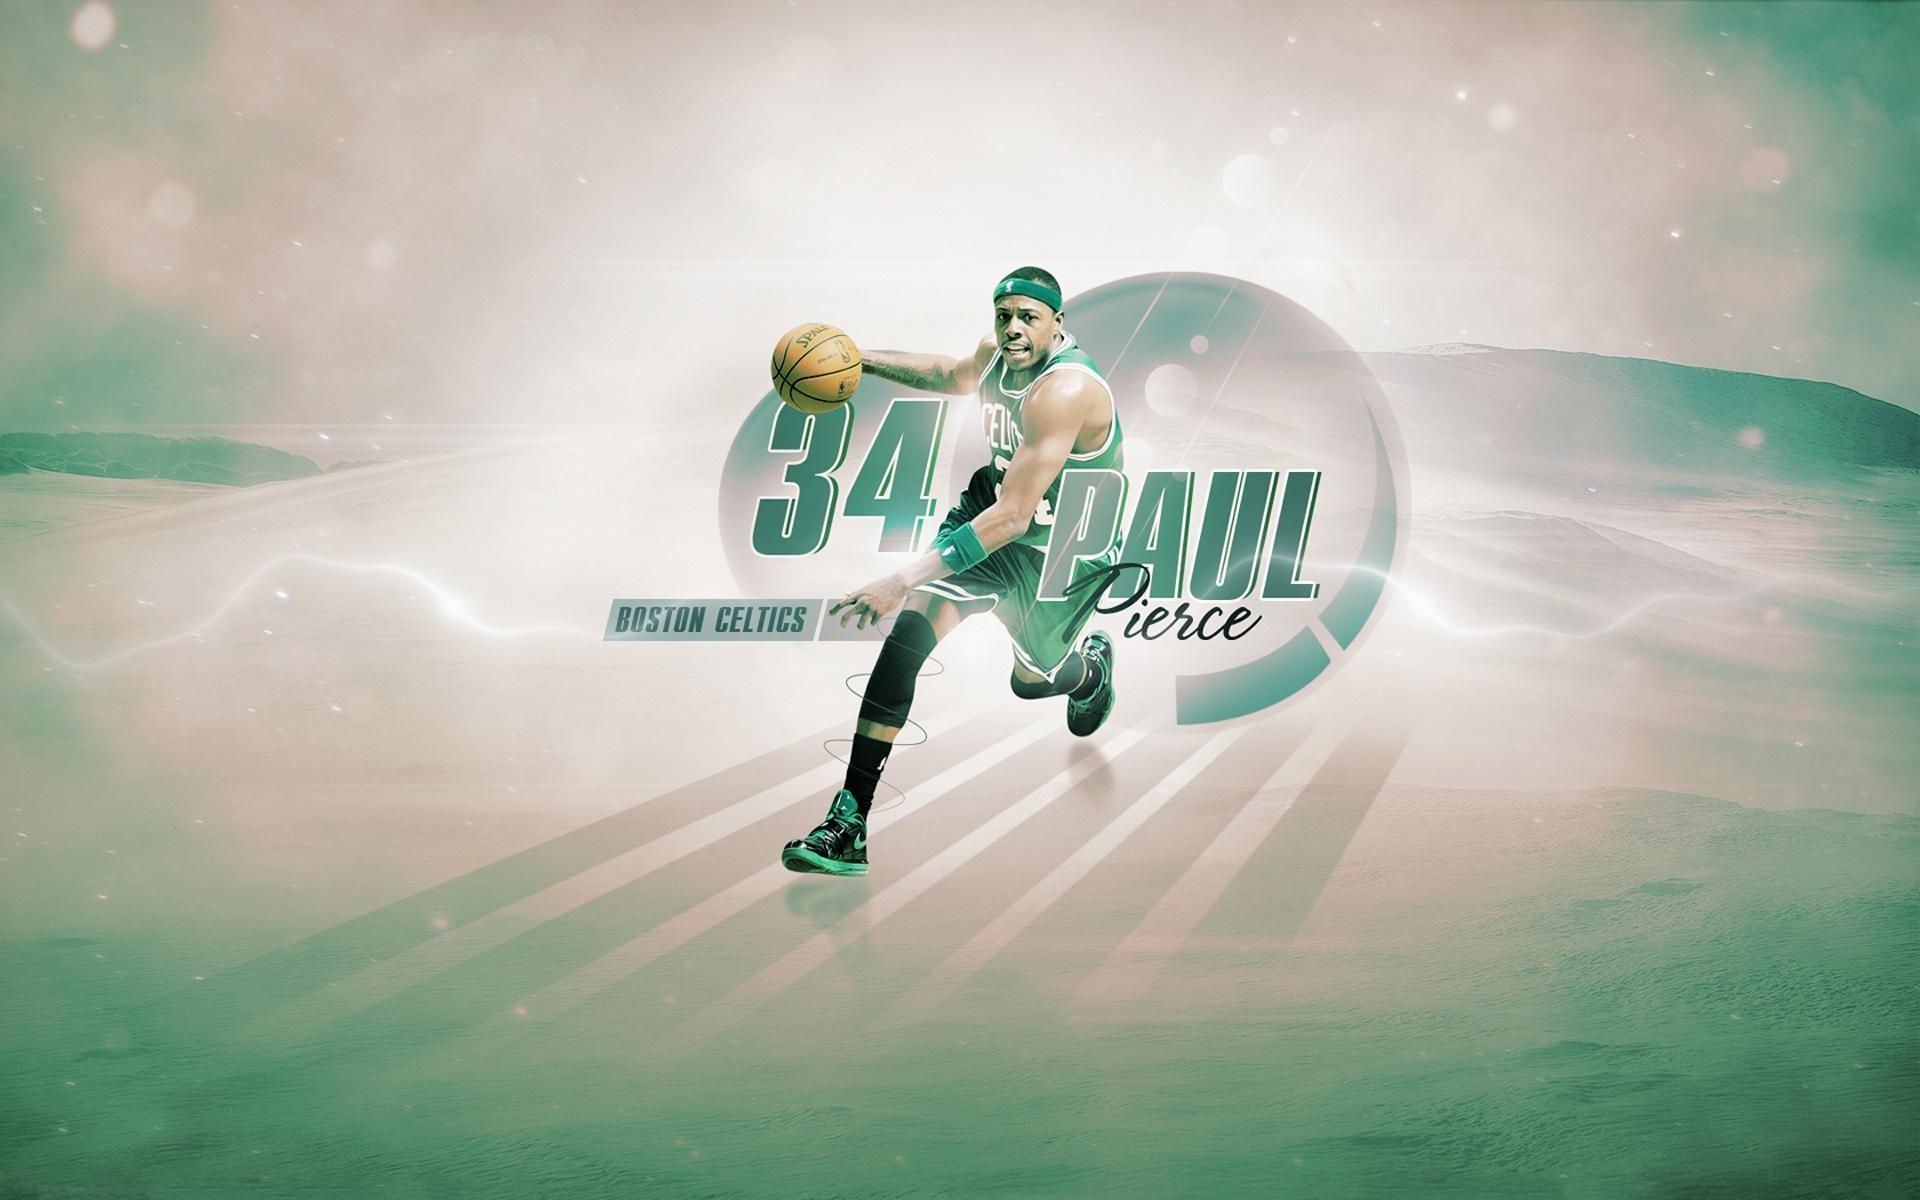 wallpaper.wiki-Celtics-Photo-PIC-WPD003696